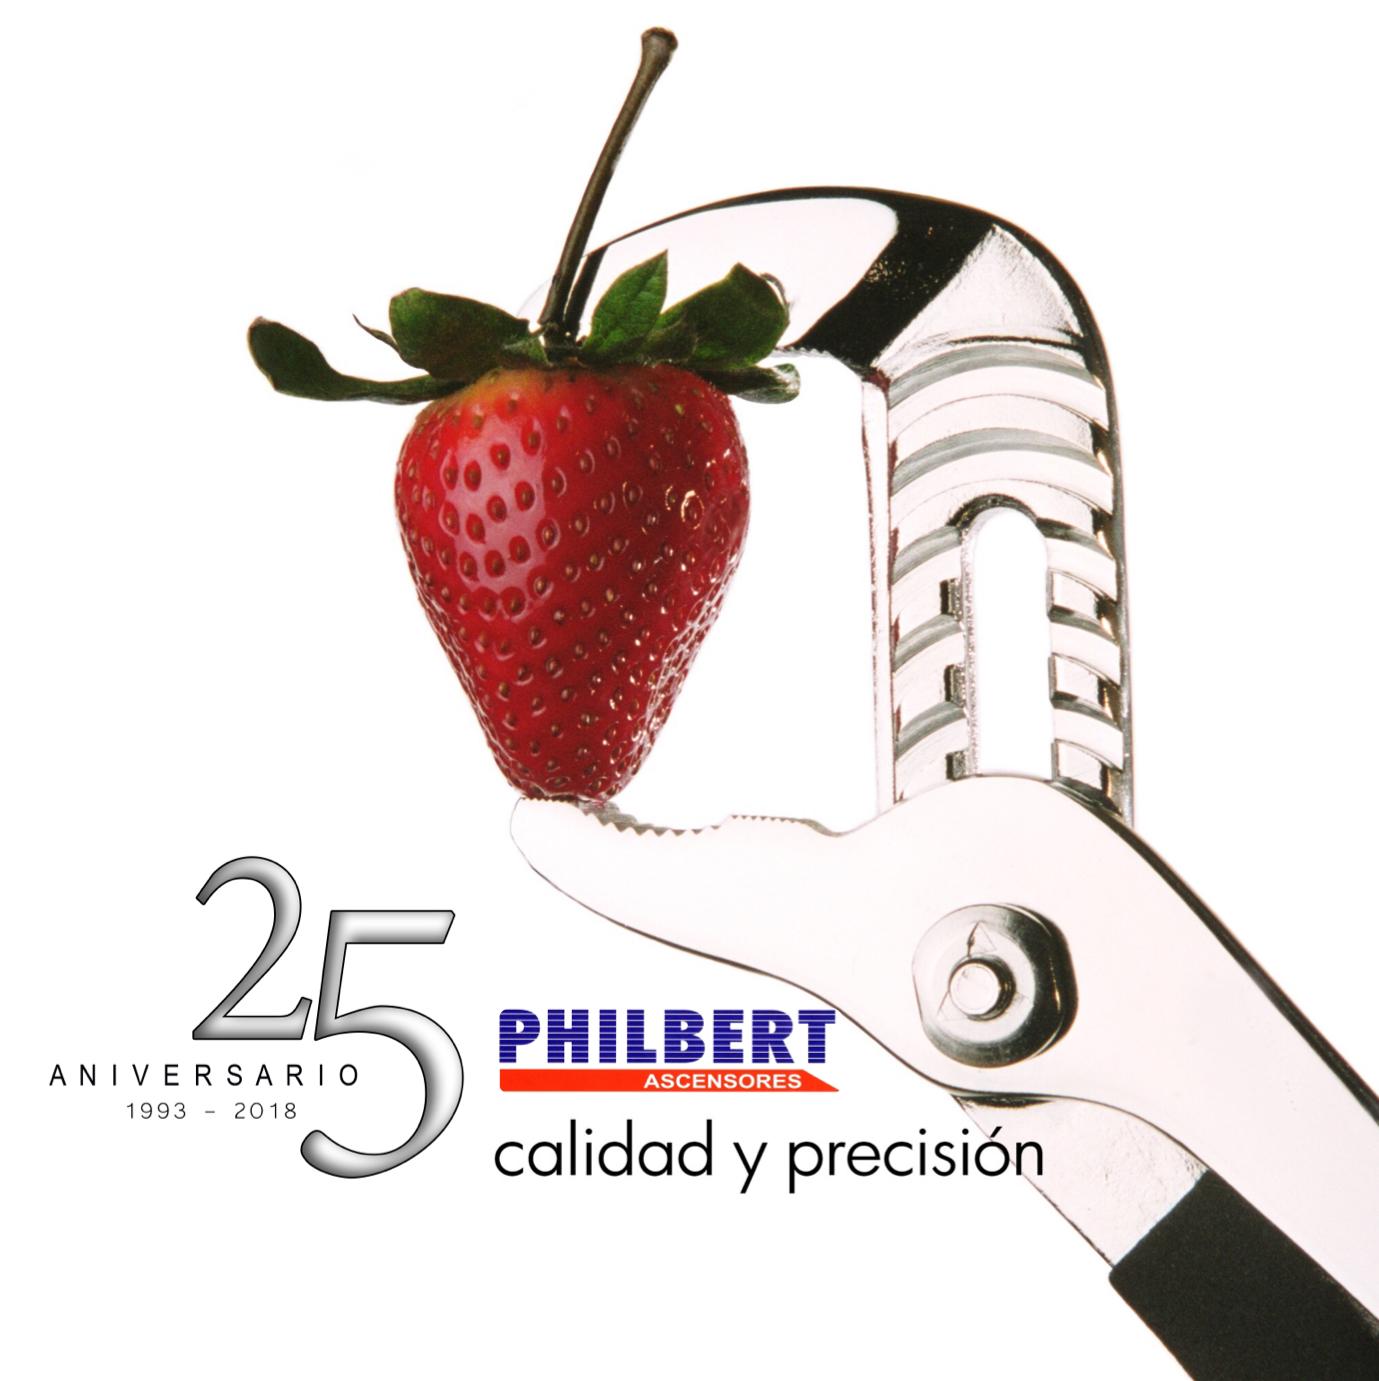 Philbert Ascensores